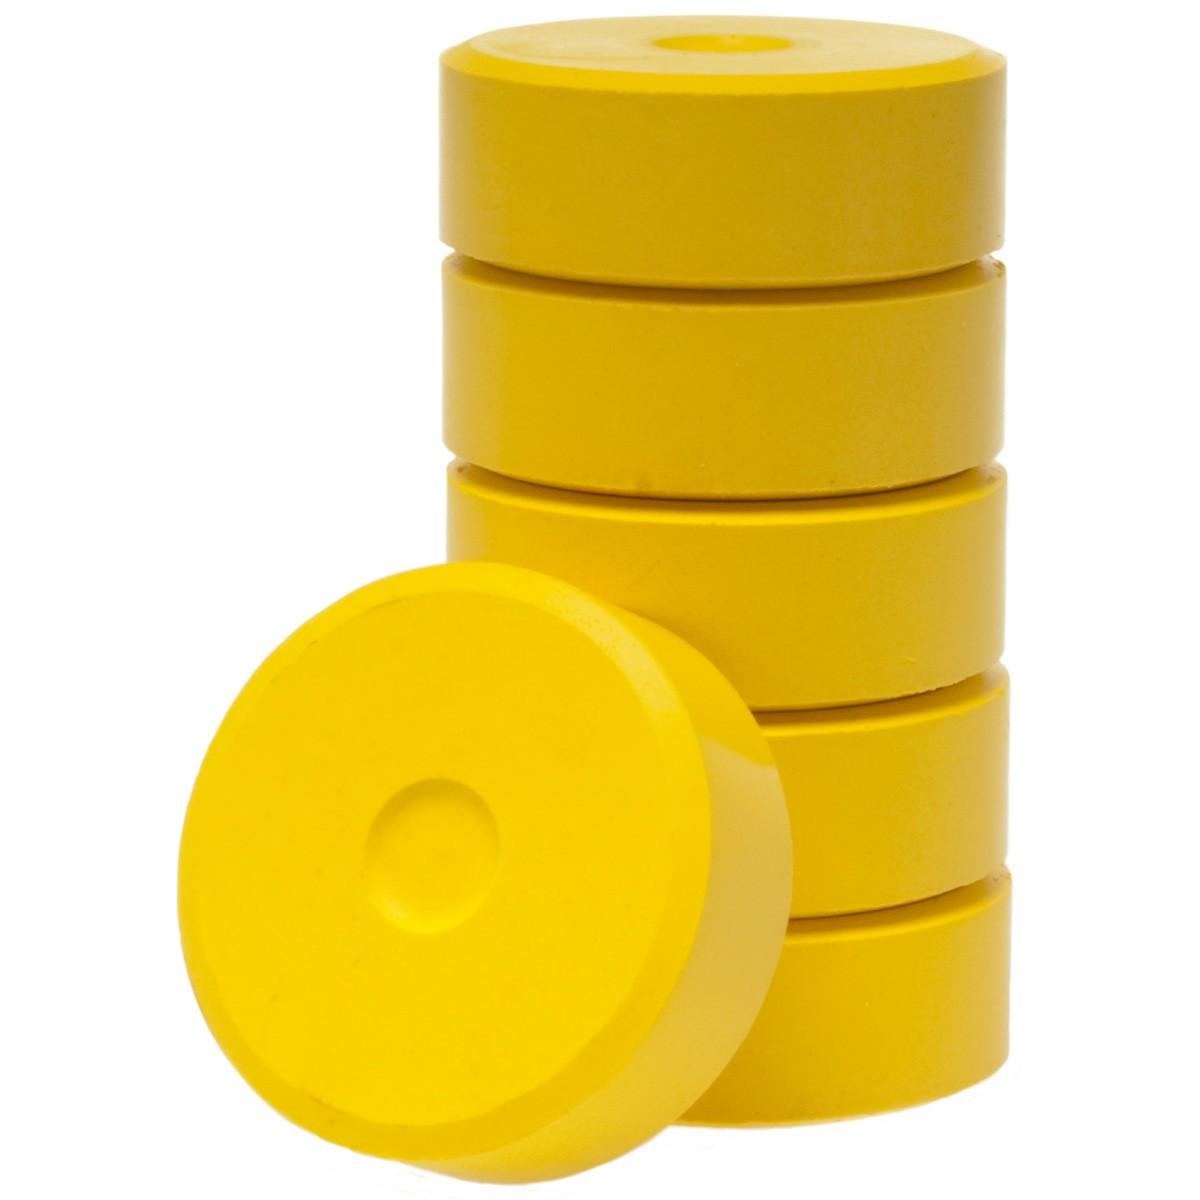 Tempera-Blöcke 44mm gelb 6 Stück - hochwertige Tempera Farb Pucks / Farbtabletten